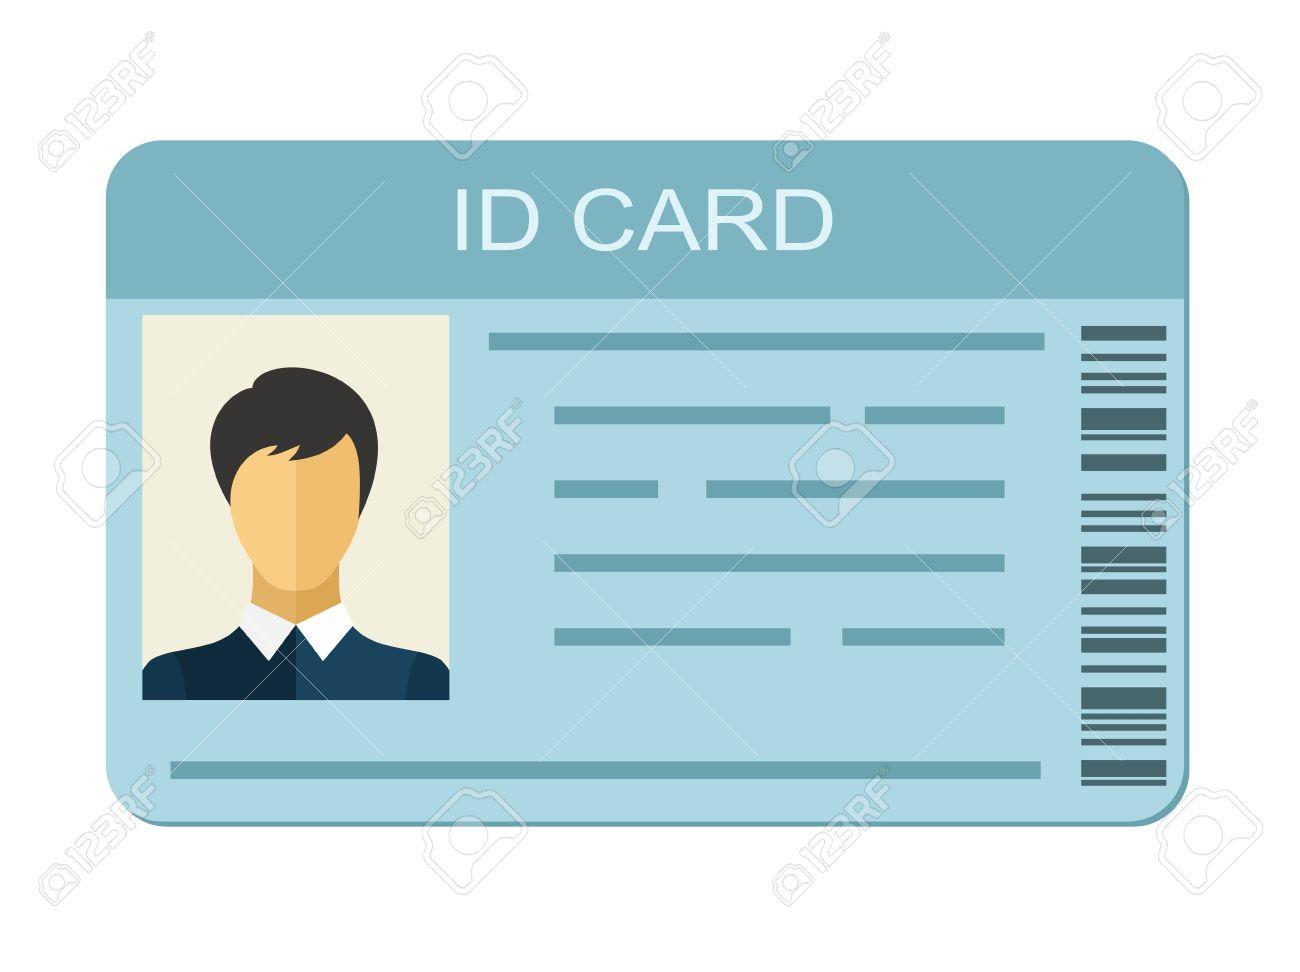 id カードは 白い背景で隔離 身分証明書アイコン ビジネス id id